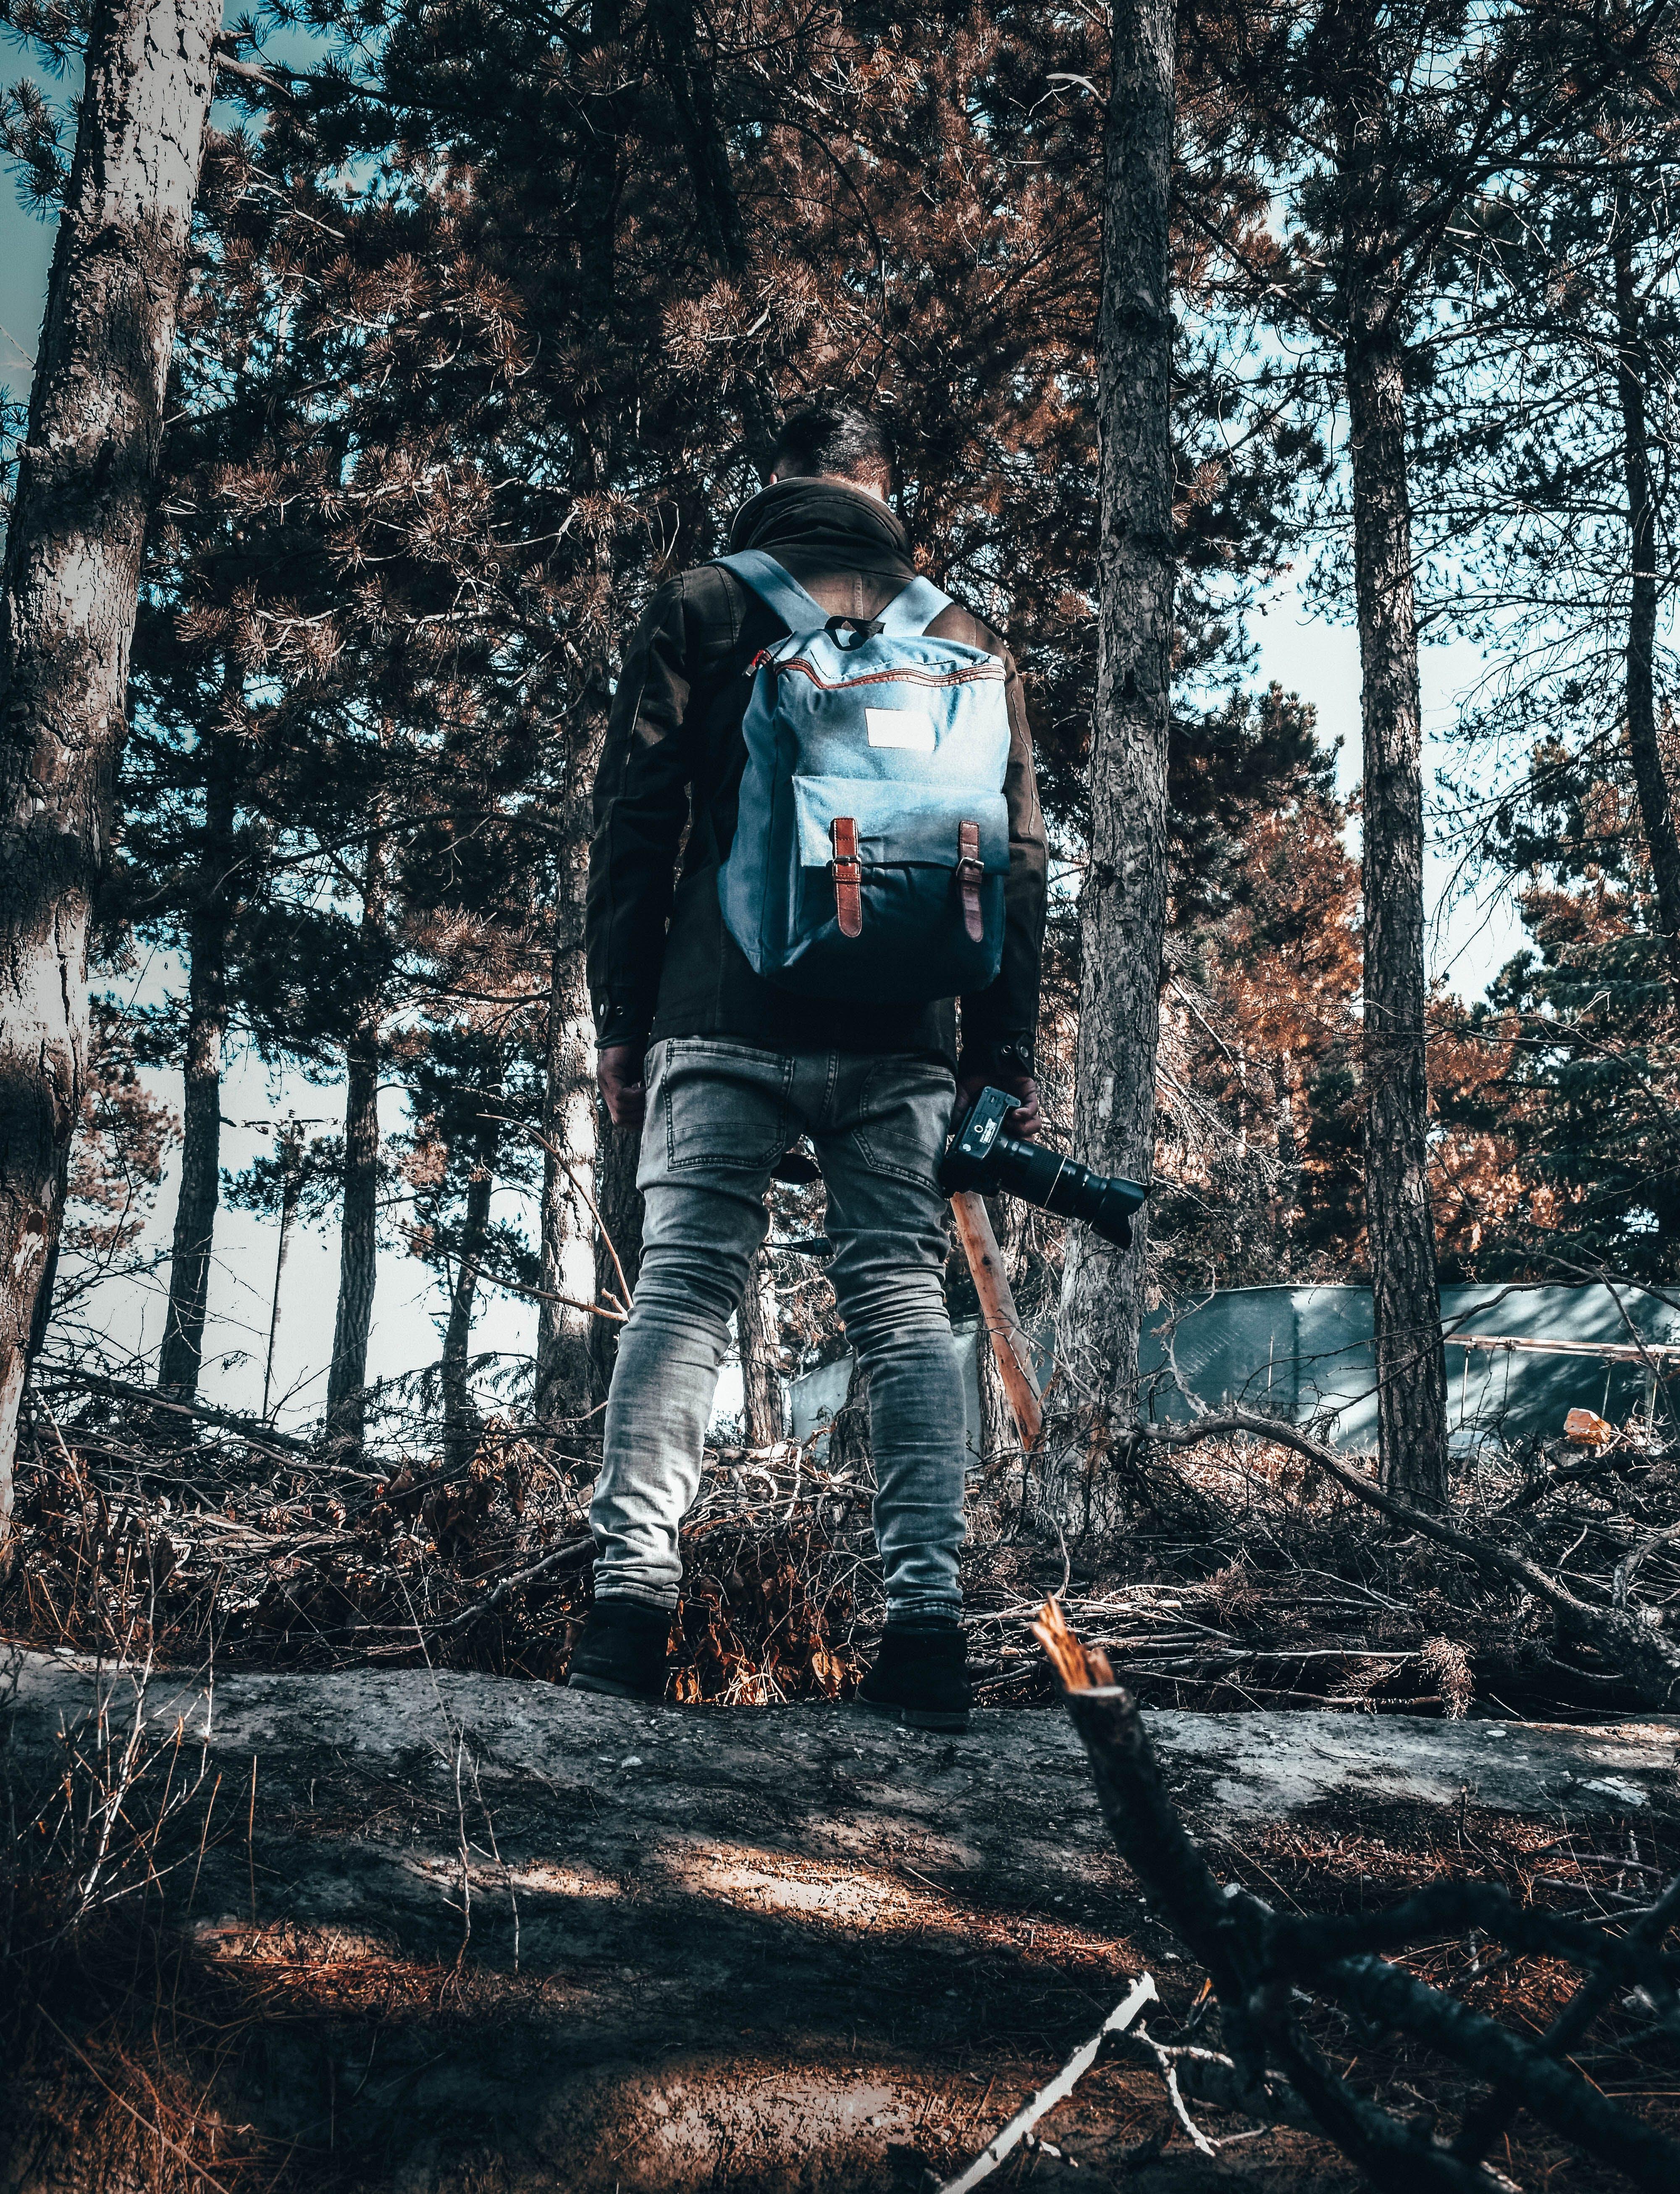 Kostenloses Stock Foto zu bäume, holz, kamera, landschaft